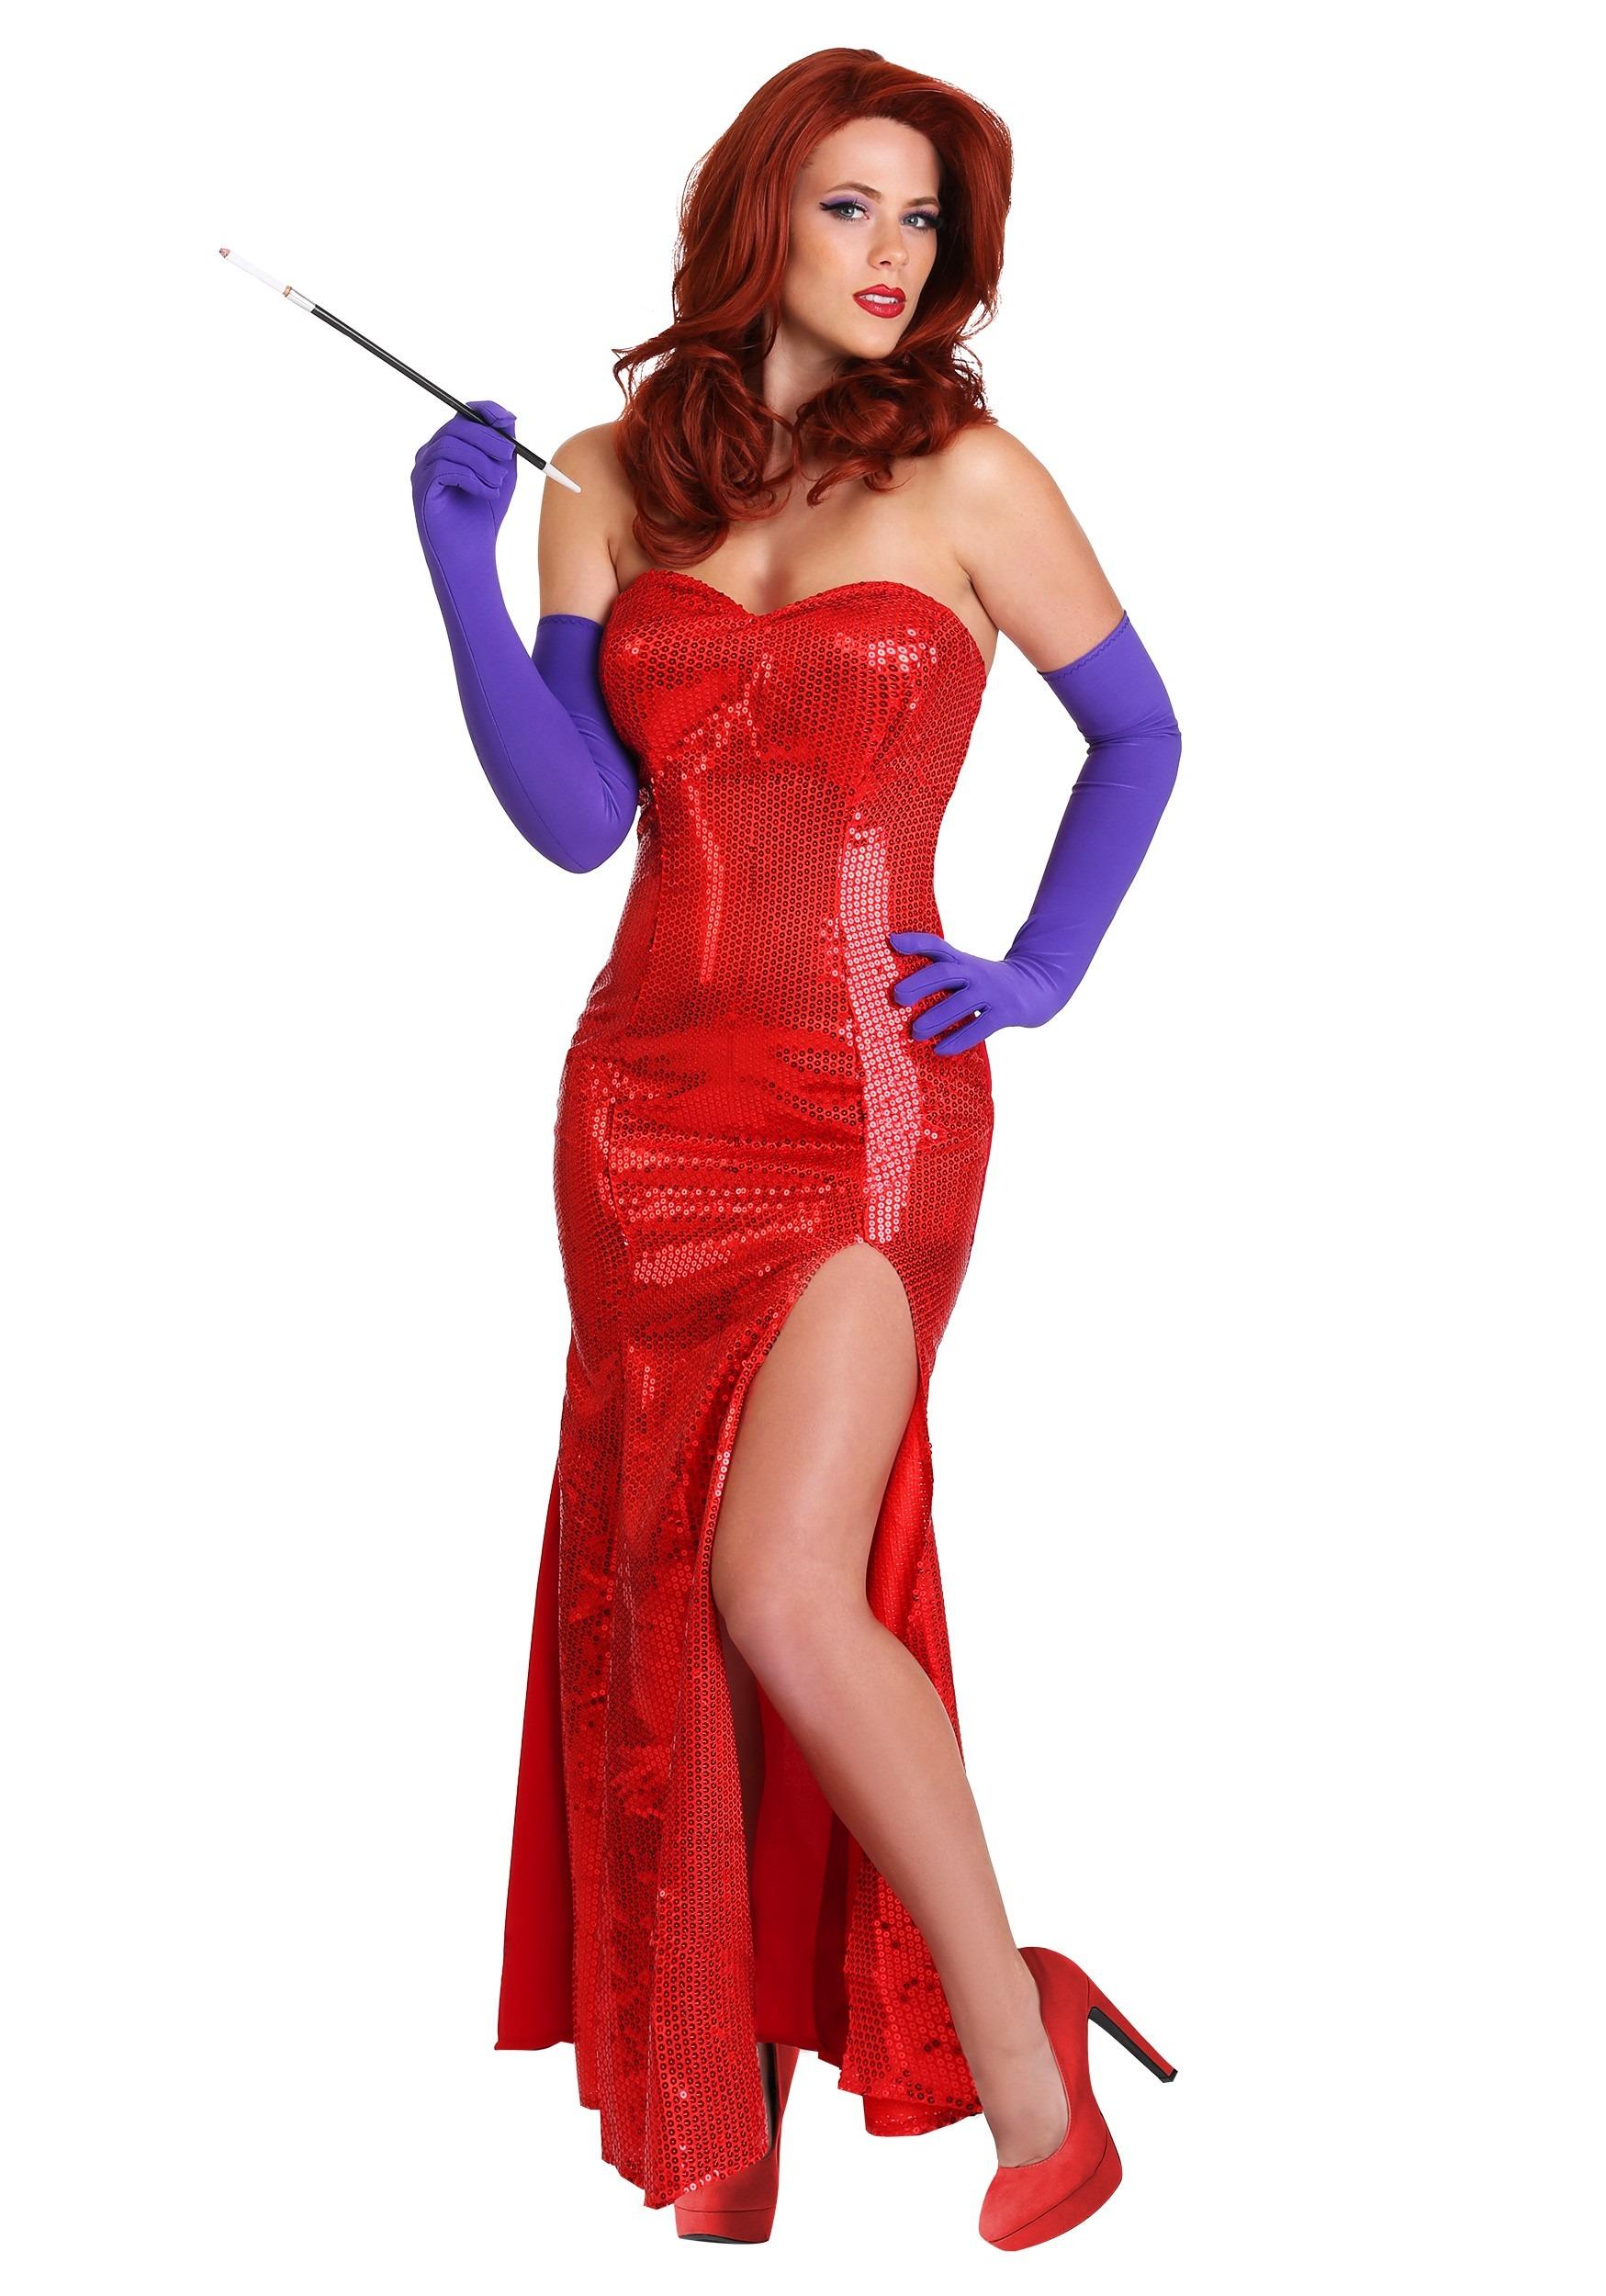 Miss Jessica ~ Red Sequin Jessica Rabbit Corset Costume Gown